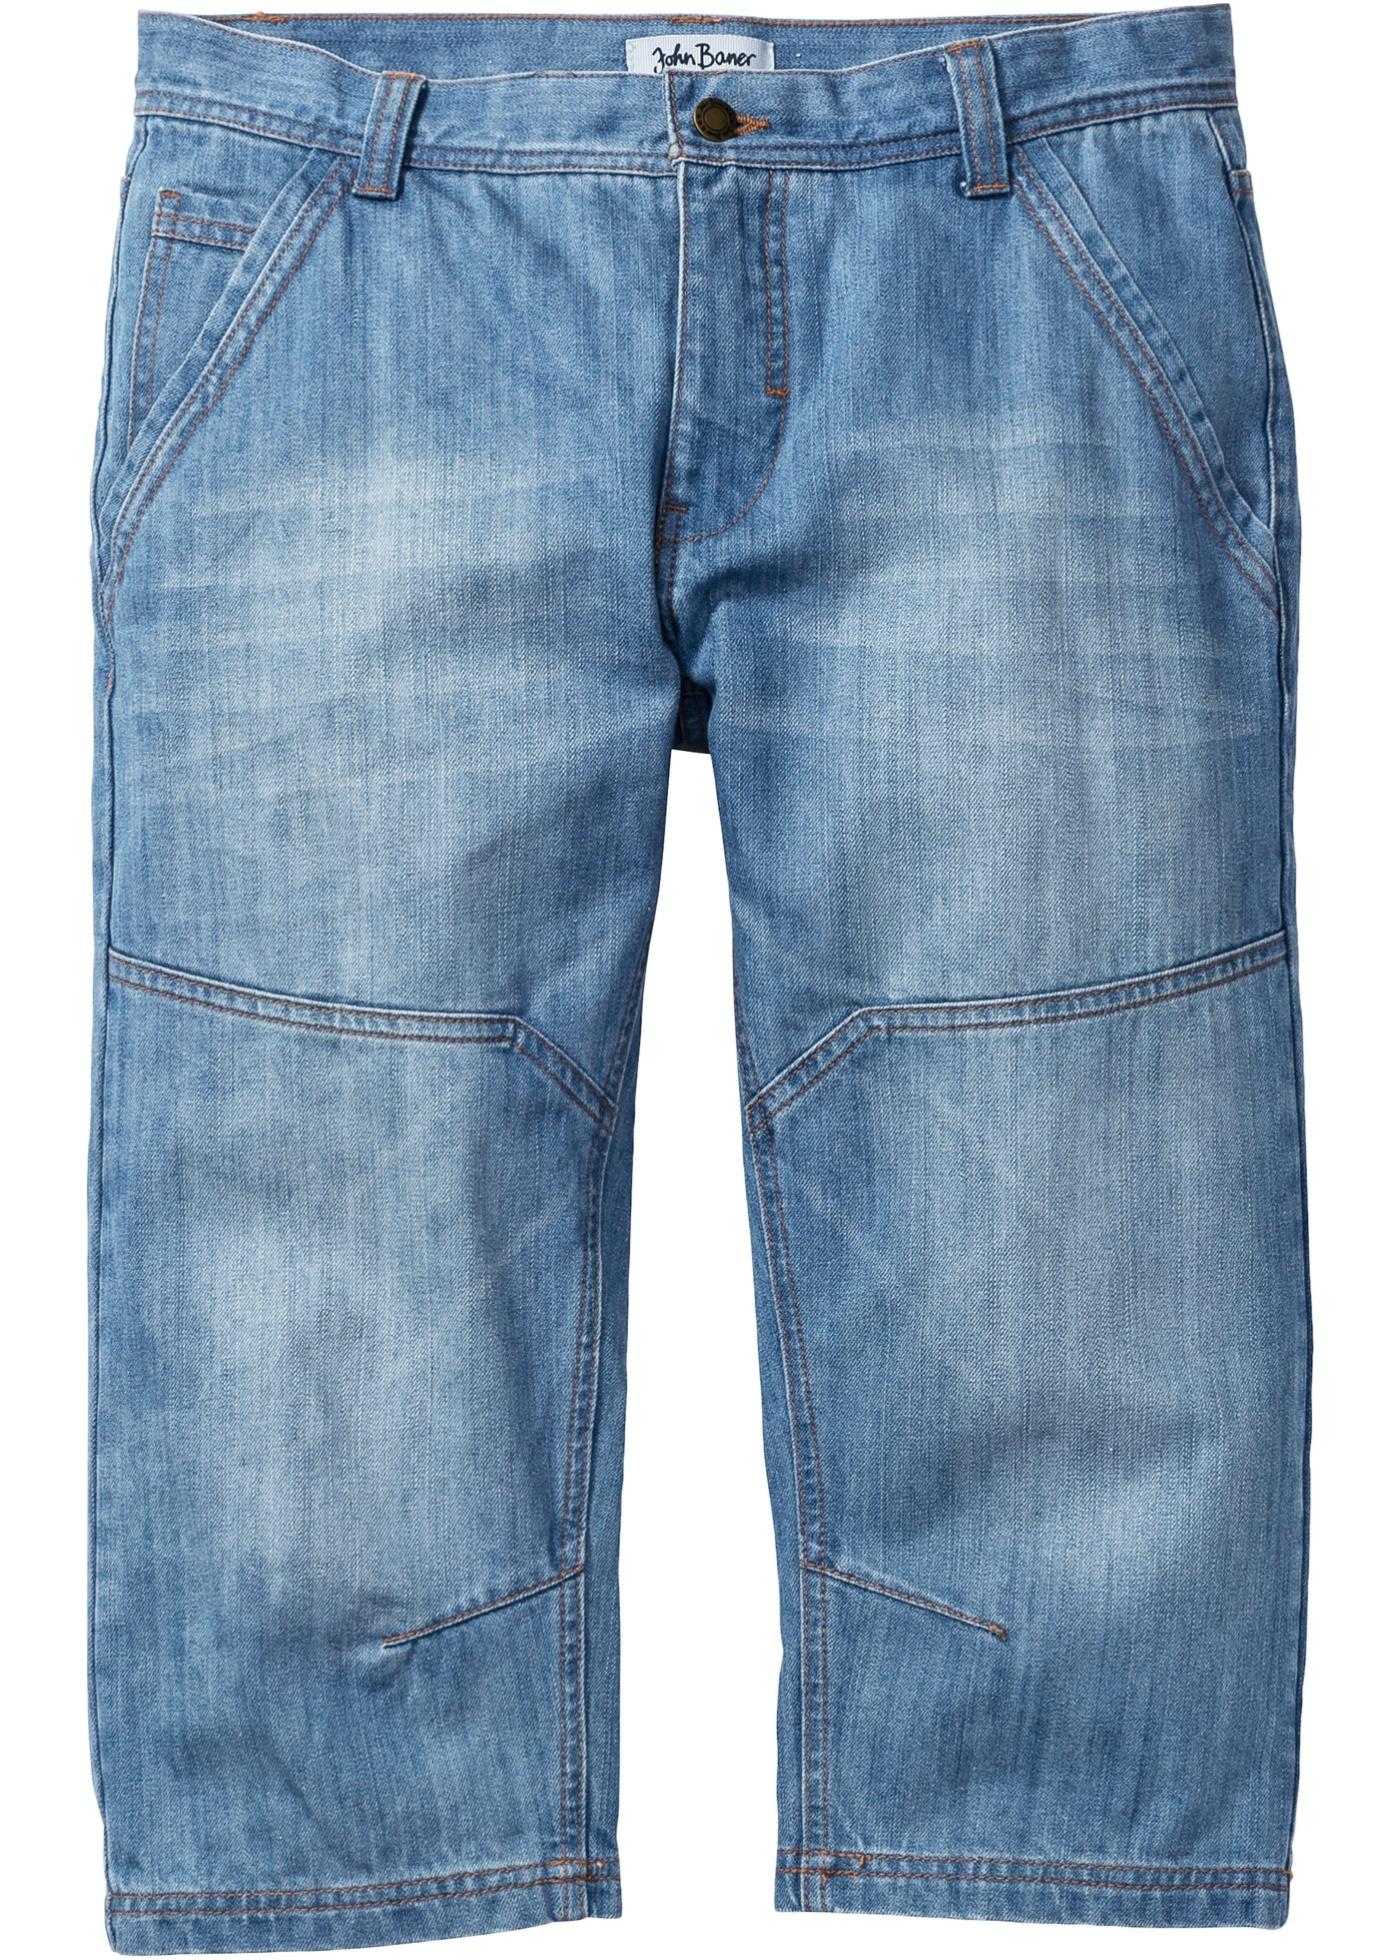 Jeans 3 4 regular fit tap